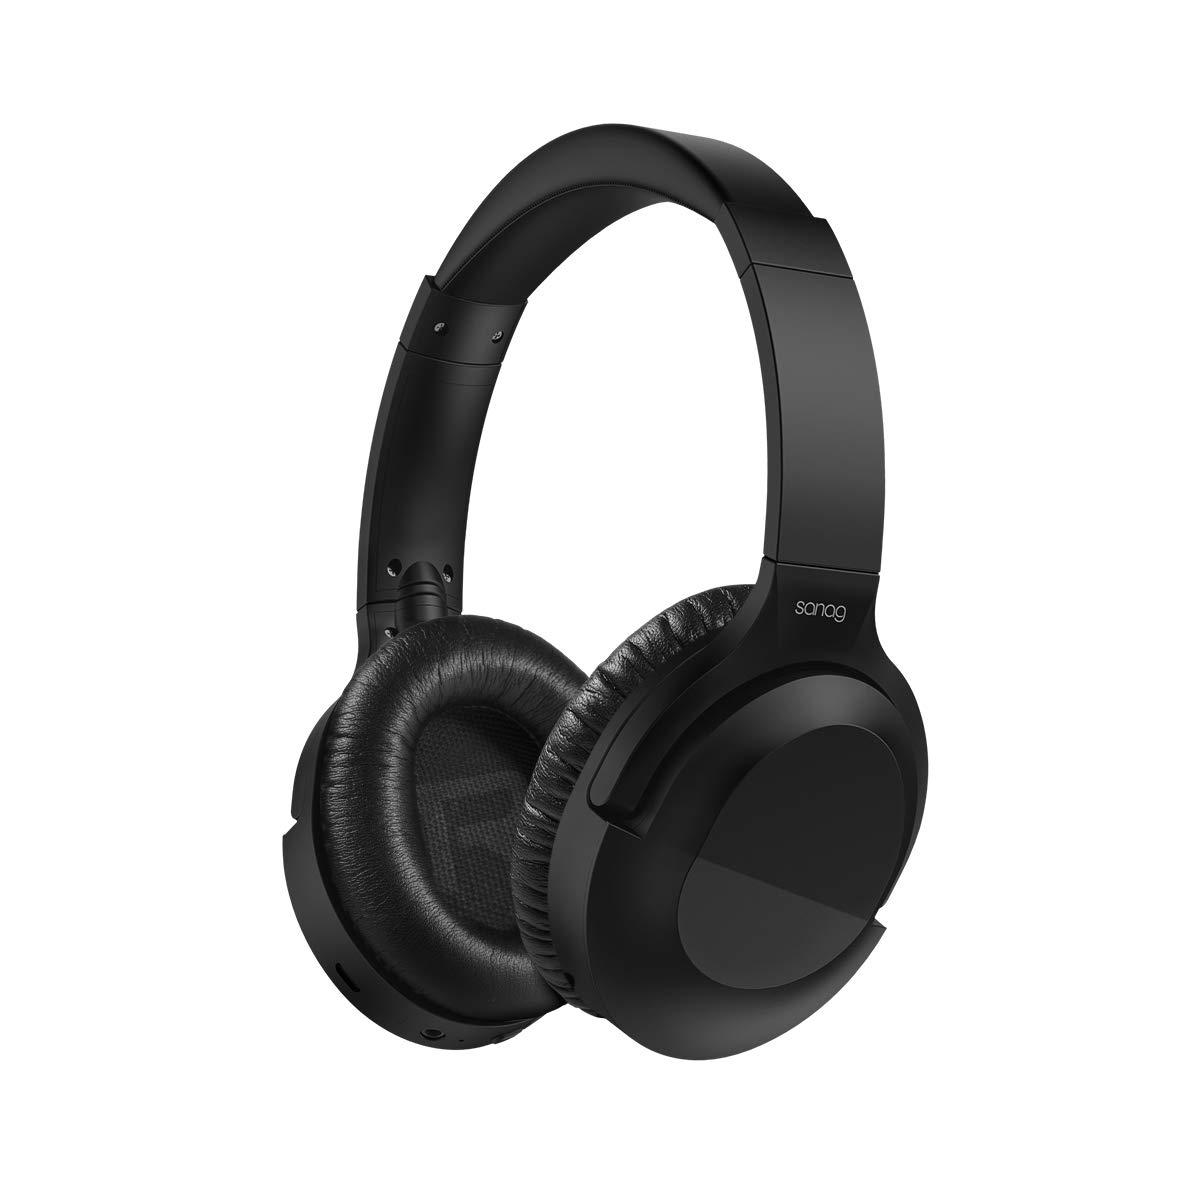 Auriculares SANAG Cancelacion de Ruido Inalambrico Bluetooth Over The Ear con Mic Industry Leading Controllable Noise Ca